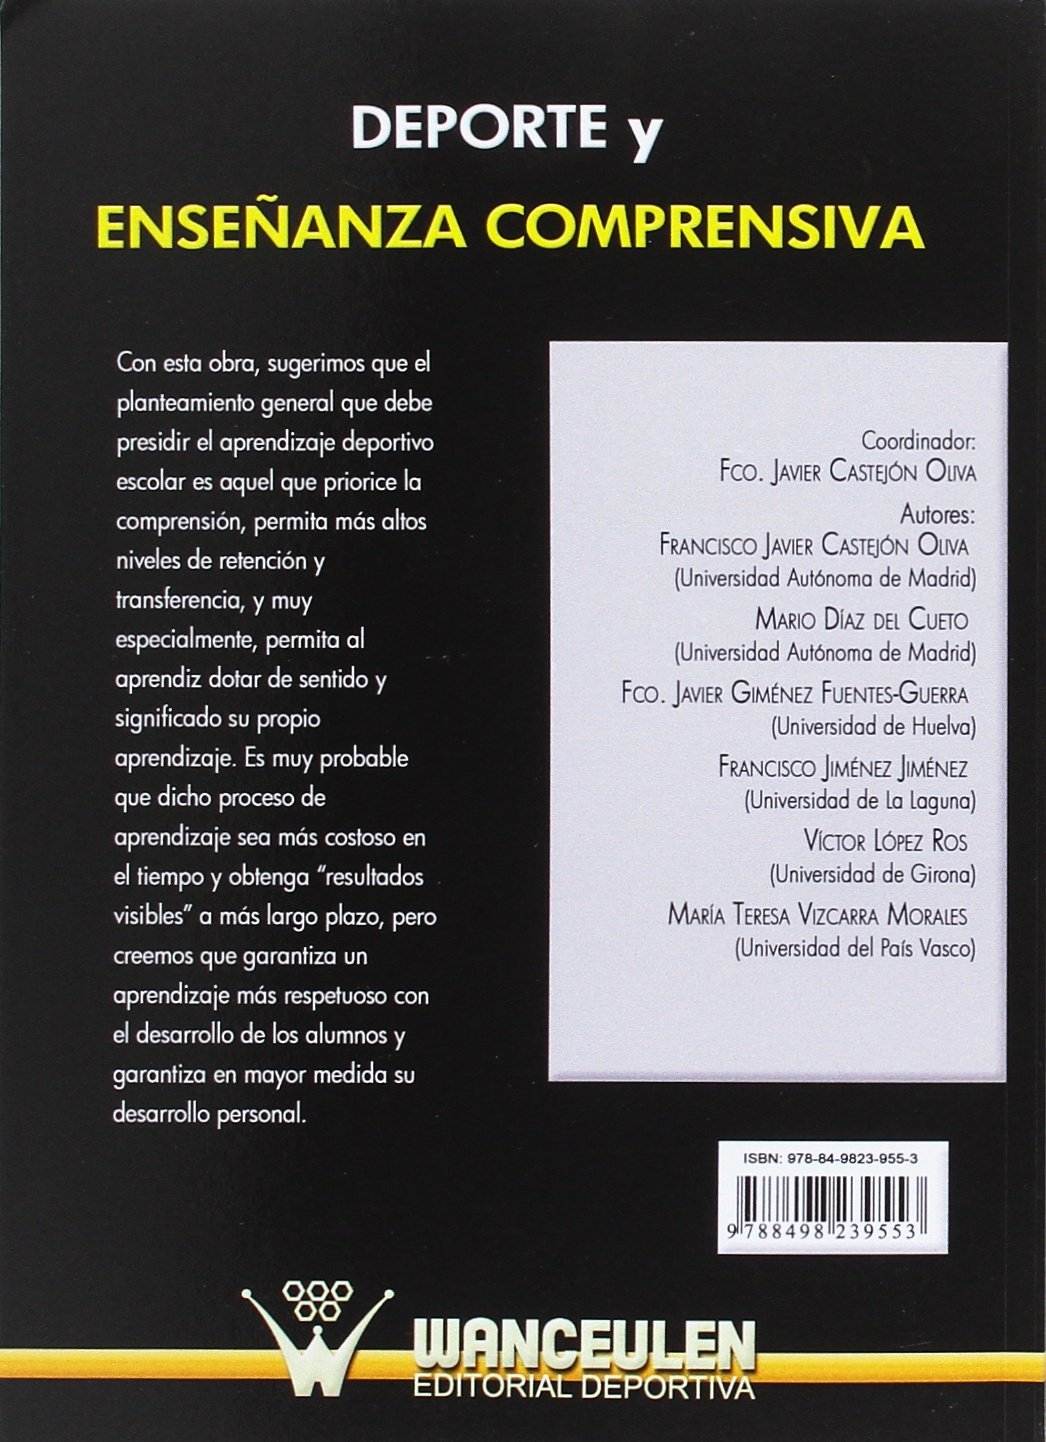 Deporte Y Enseñanza Comprensiva (Spanish Edition): Franciscoj Castejón: 9788498239553: Amazon.com: Books